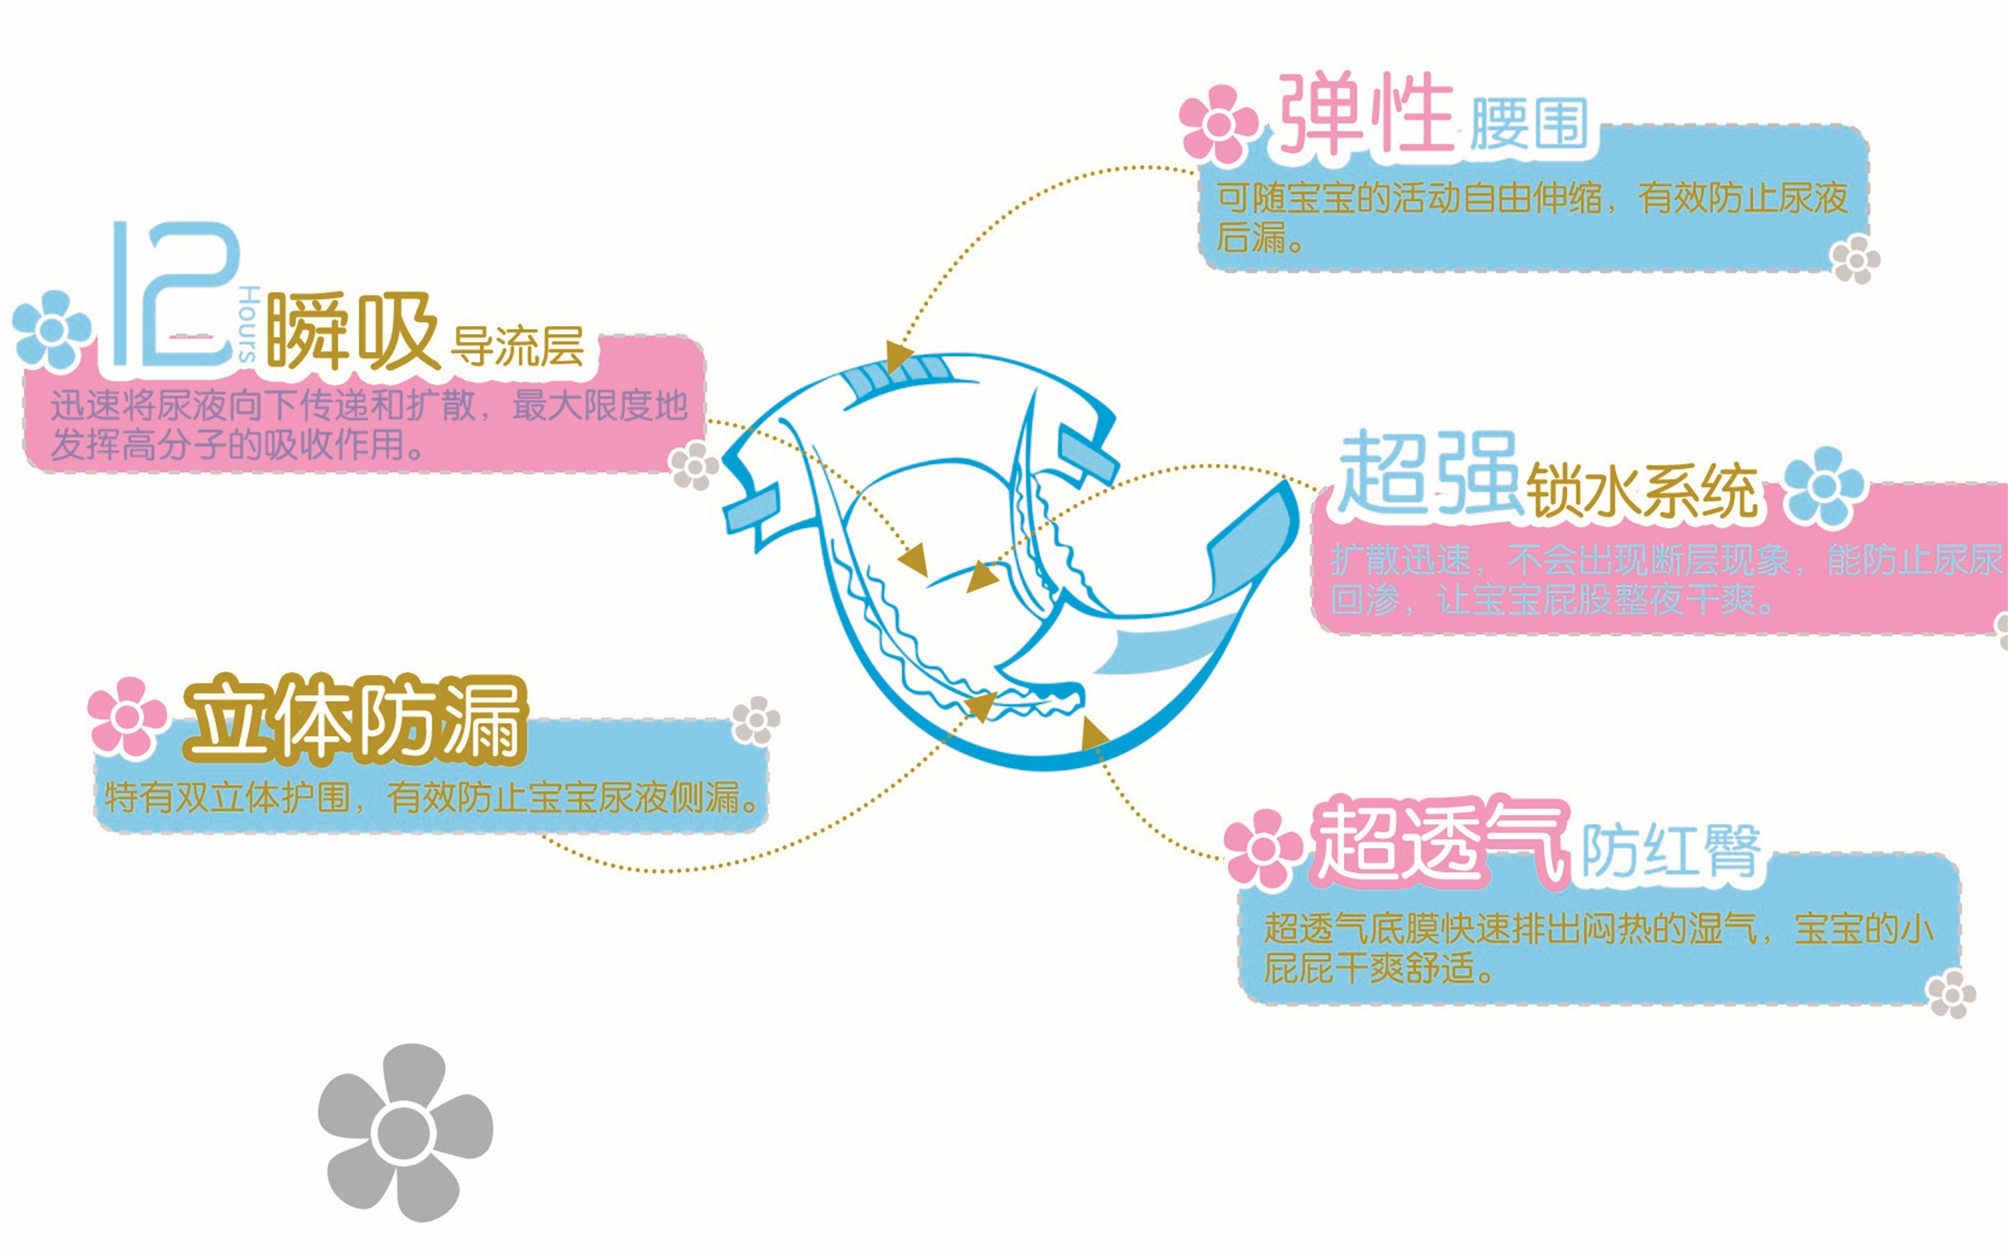 花环边框 素材 shi'liang